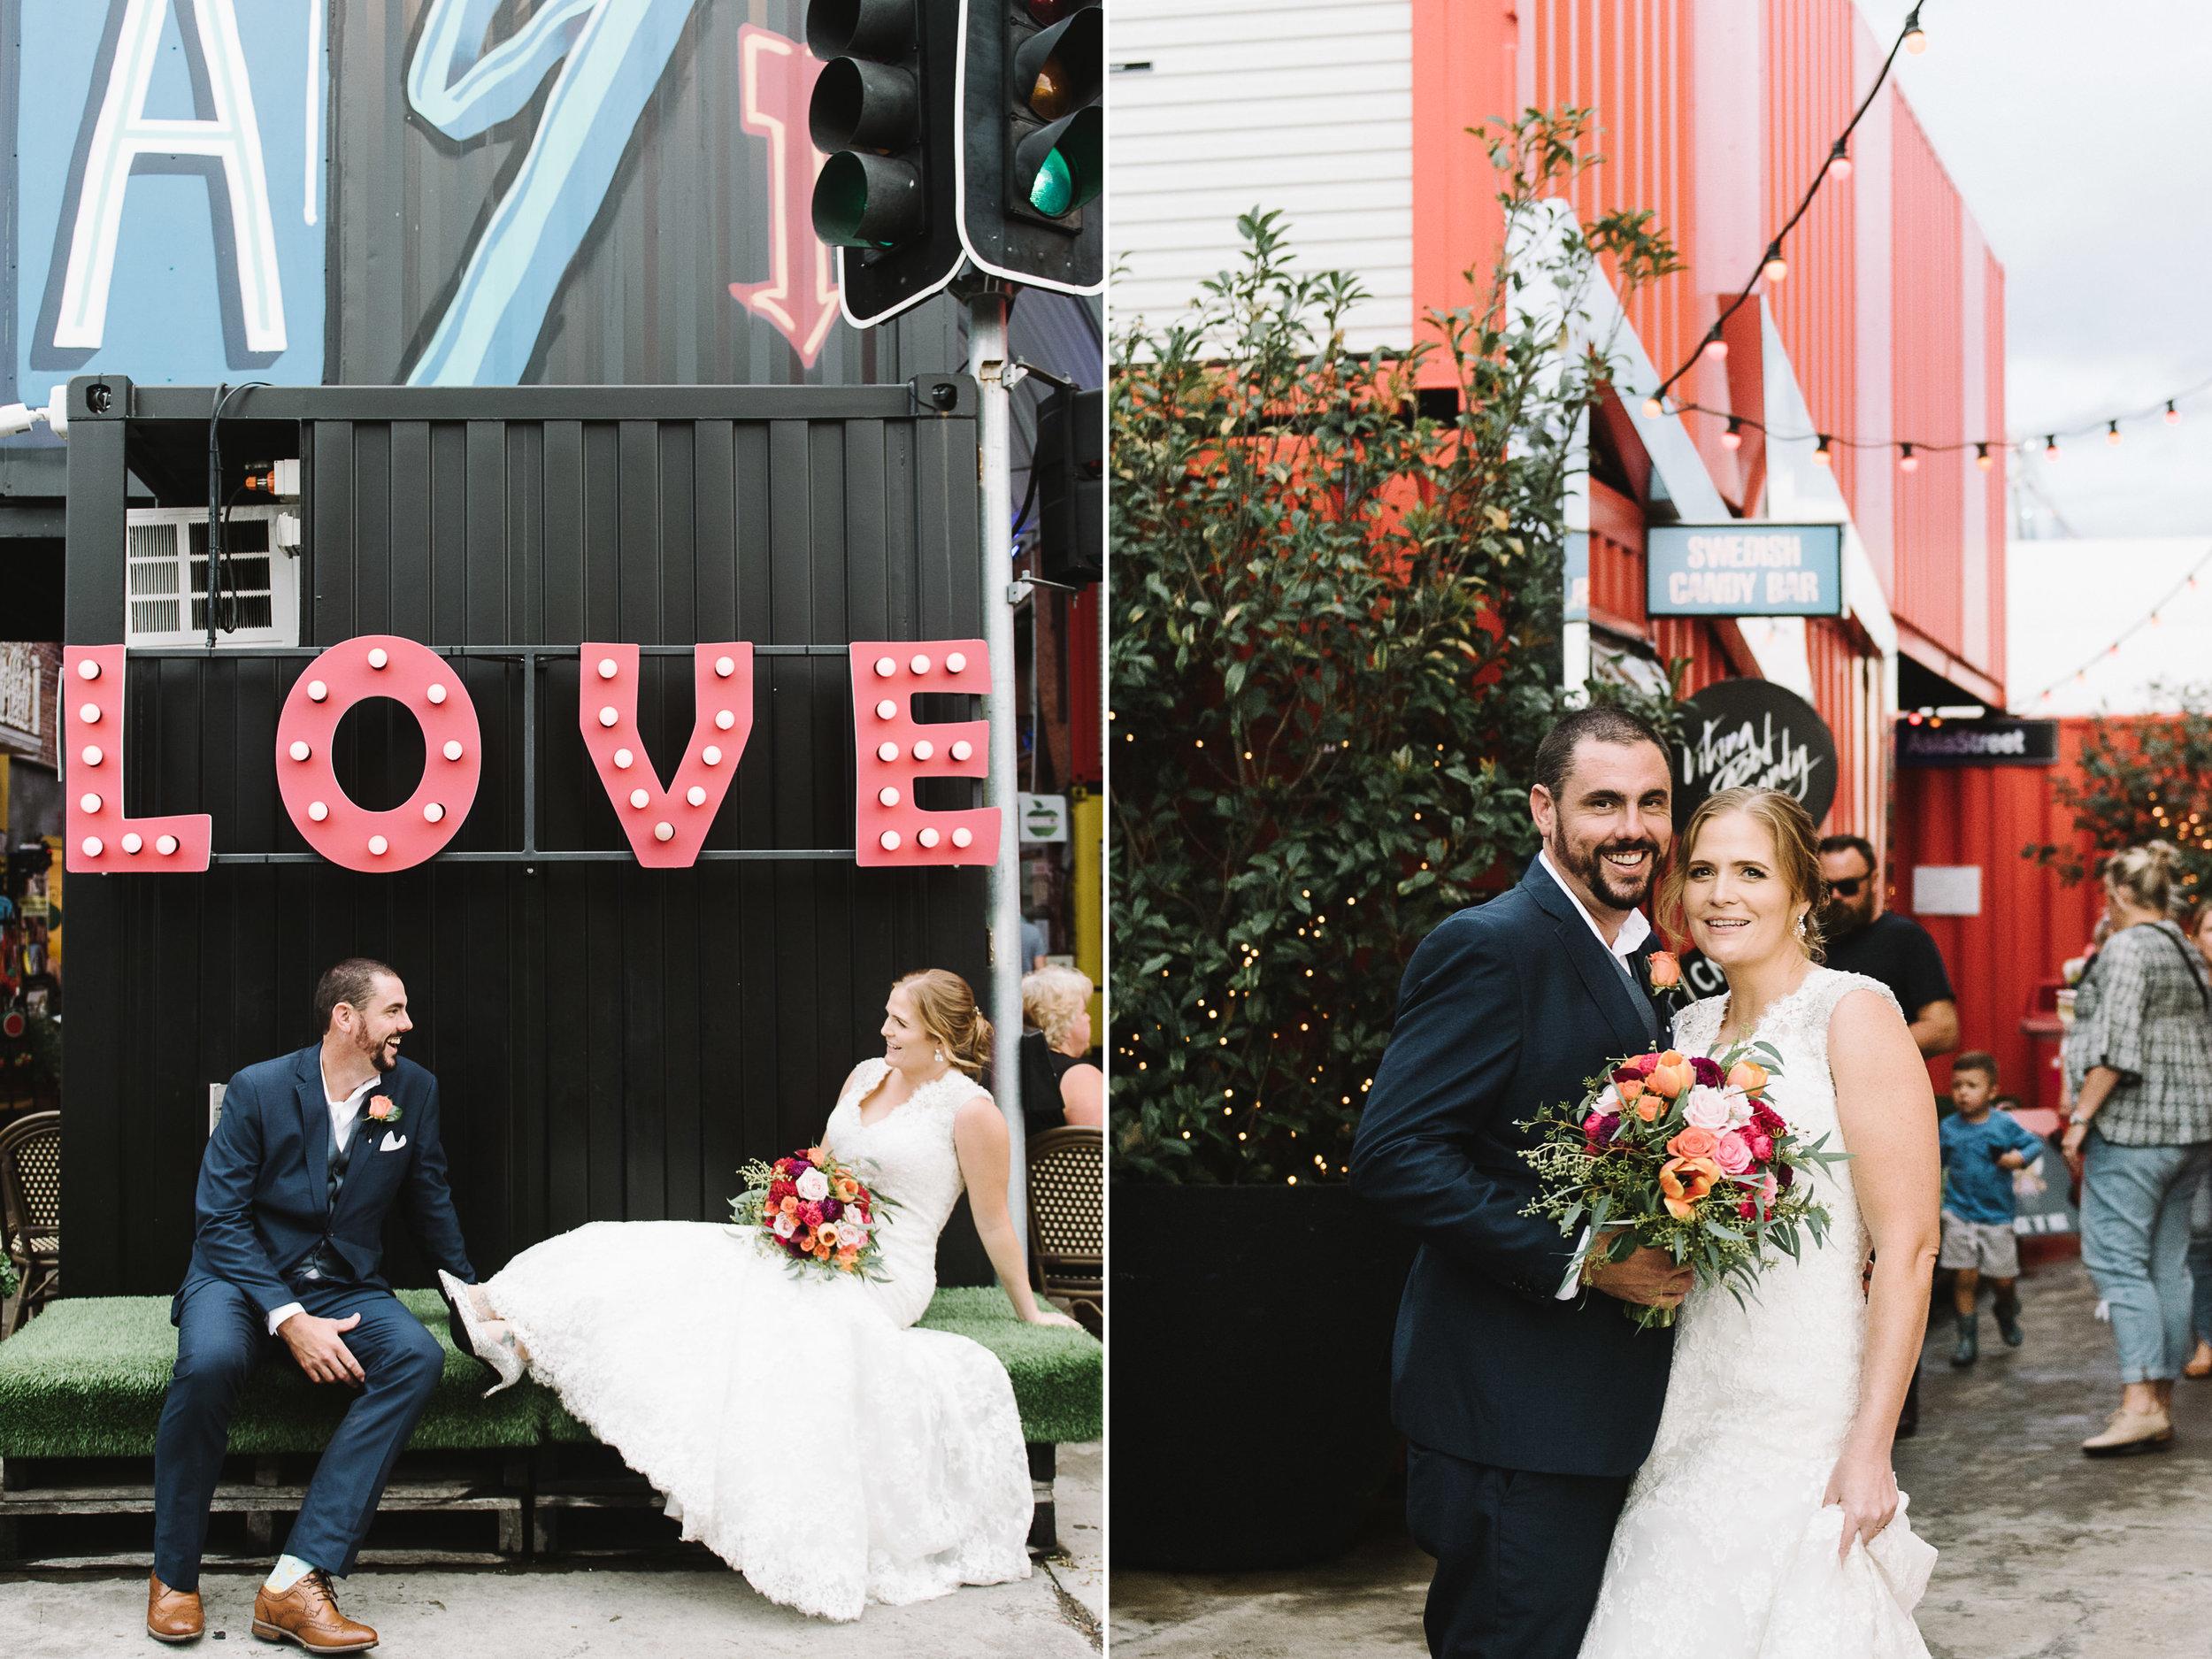 Eat-Street-Market-Wedding-6.jpg